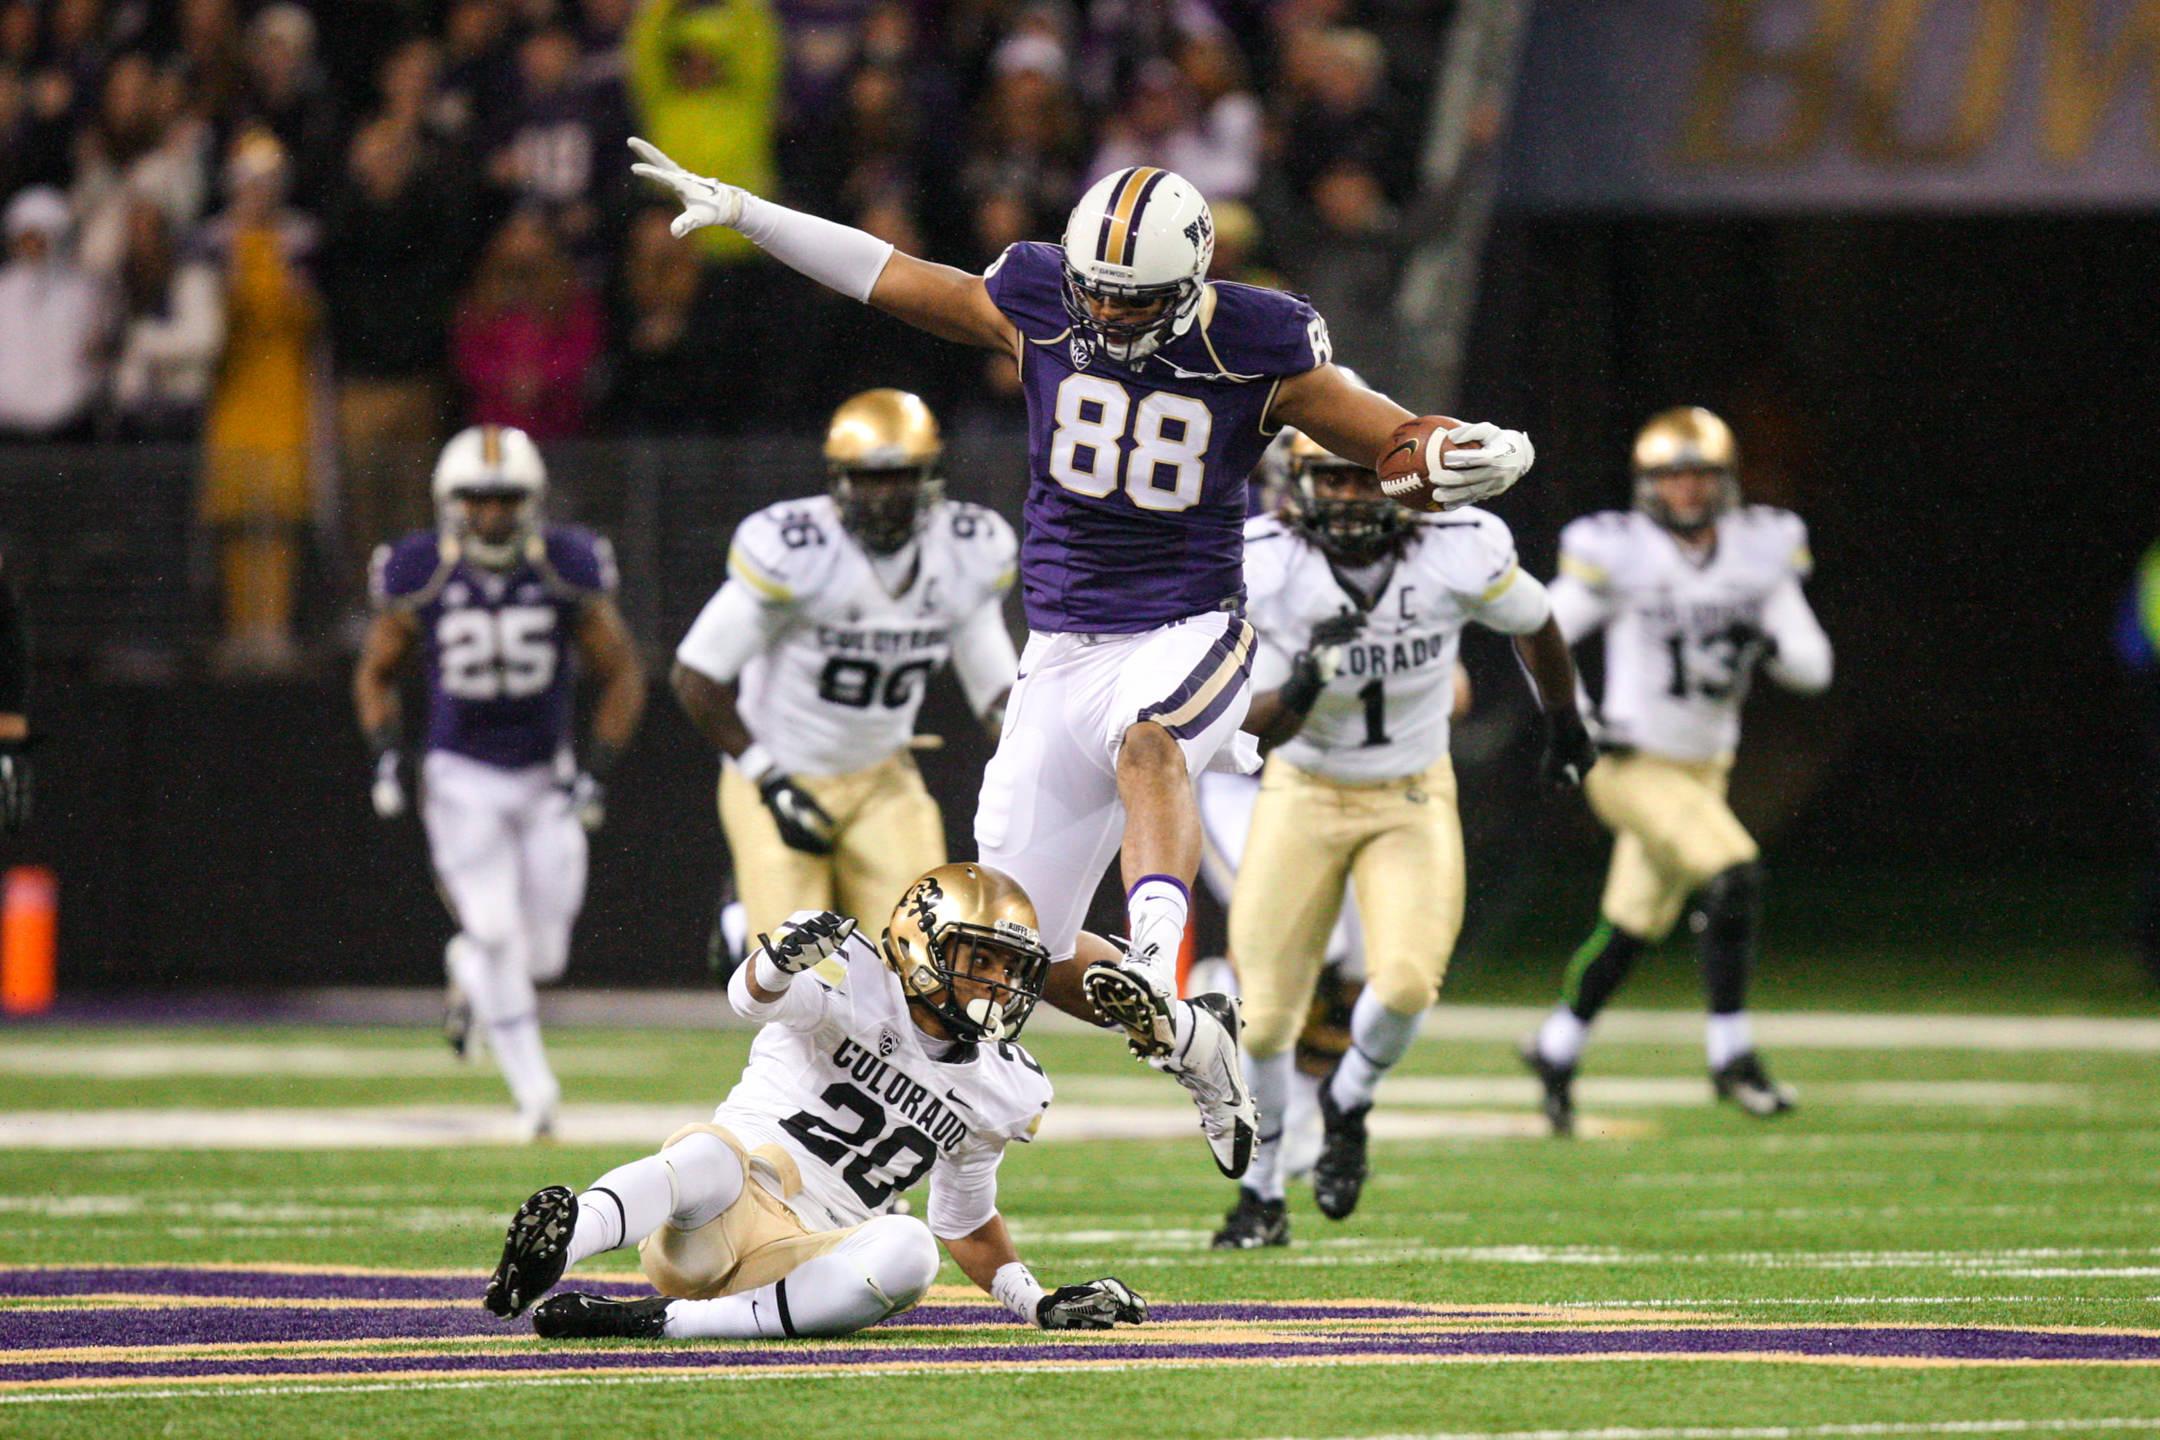 University of Washington Huskies Tight End Austin Seferian-Jenkins Jumping Over Colorado University Buffalos Defender